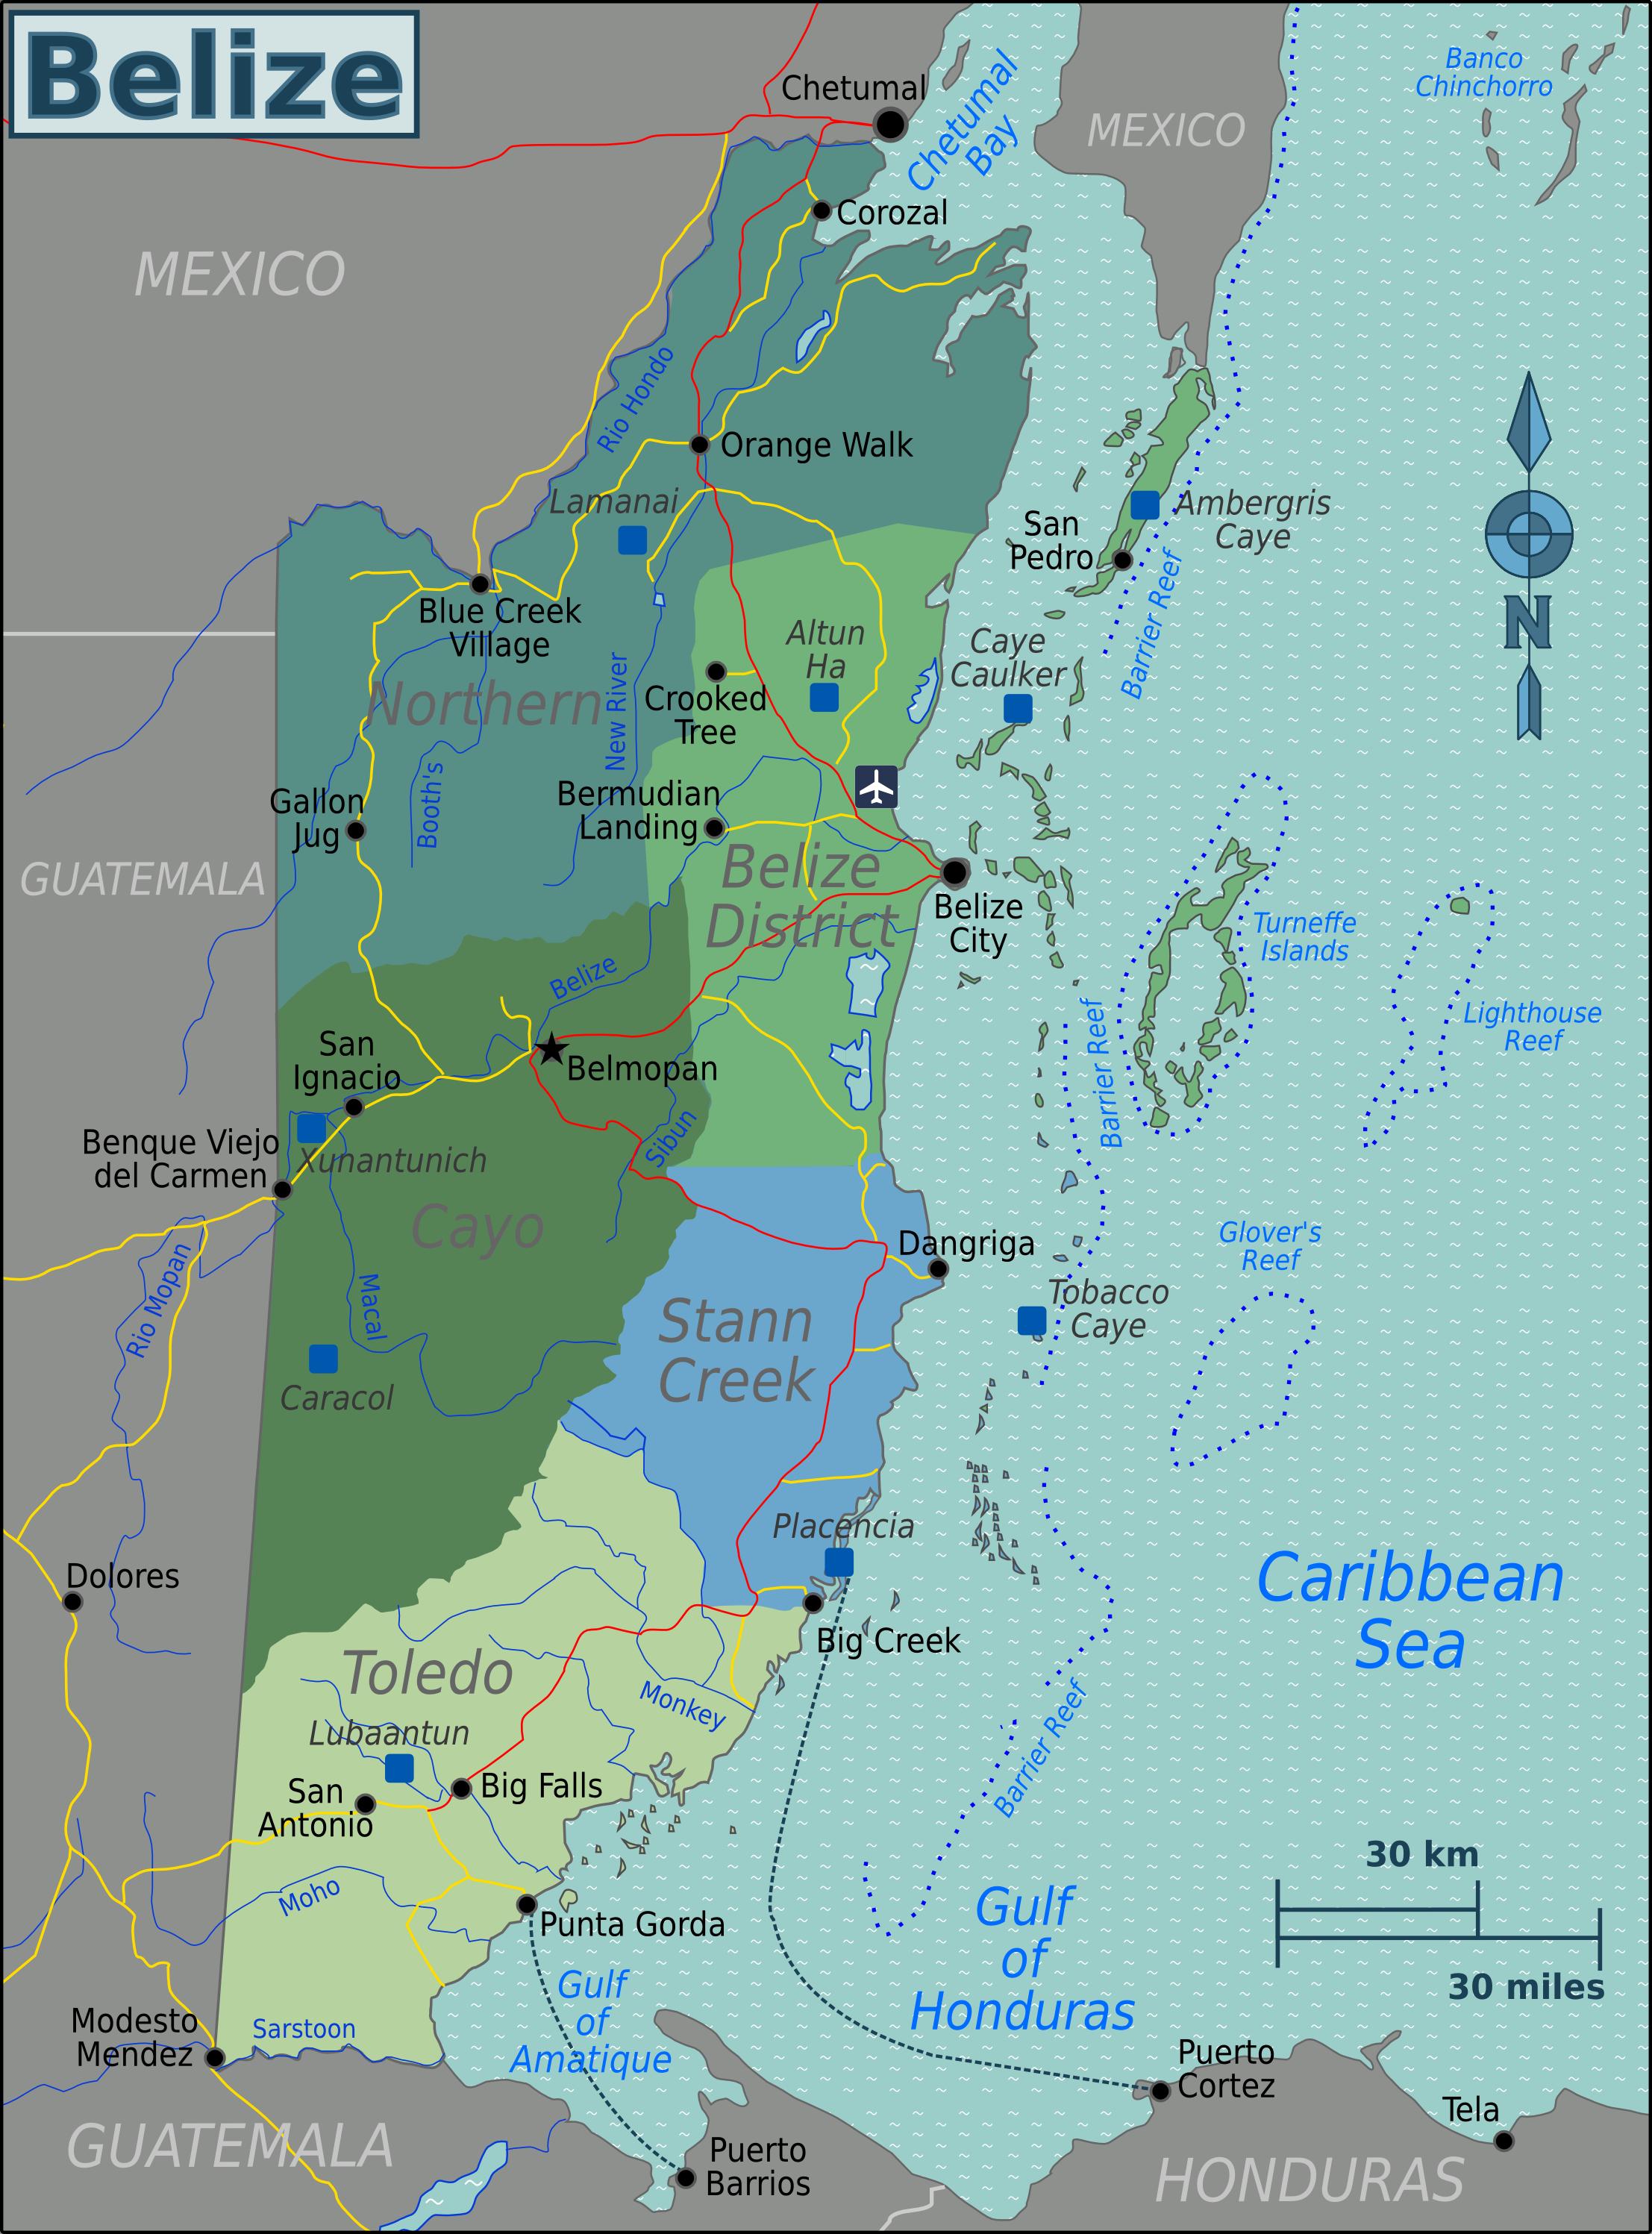 Regional map of Belize | Maps in 2018 | Pinterest | Belize travel ...